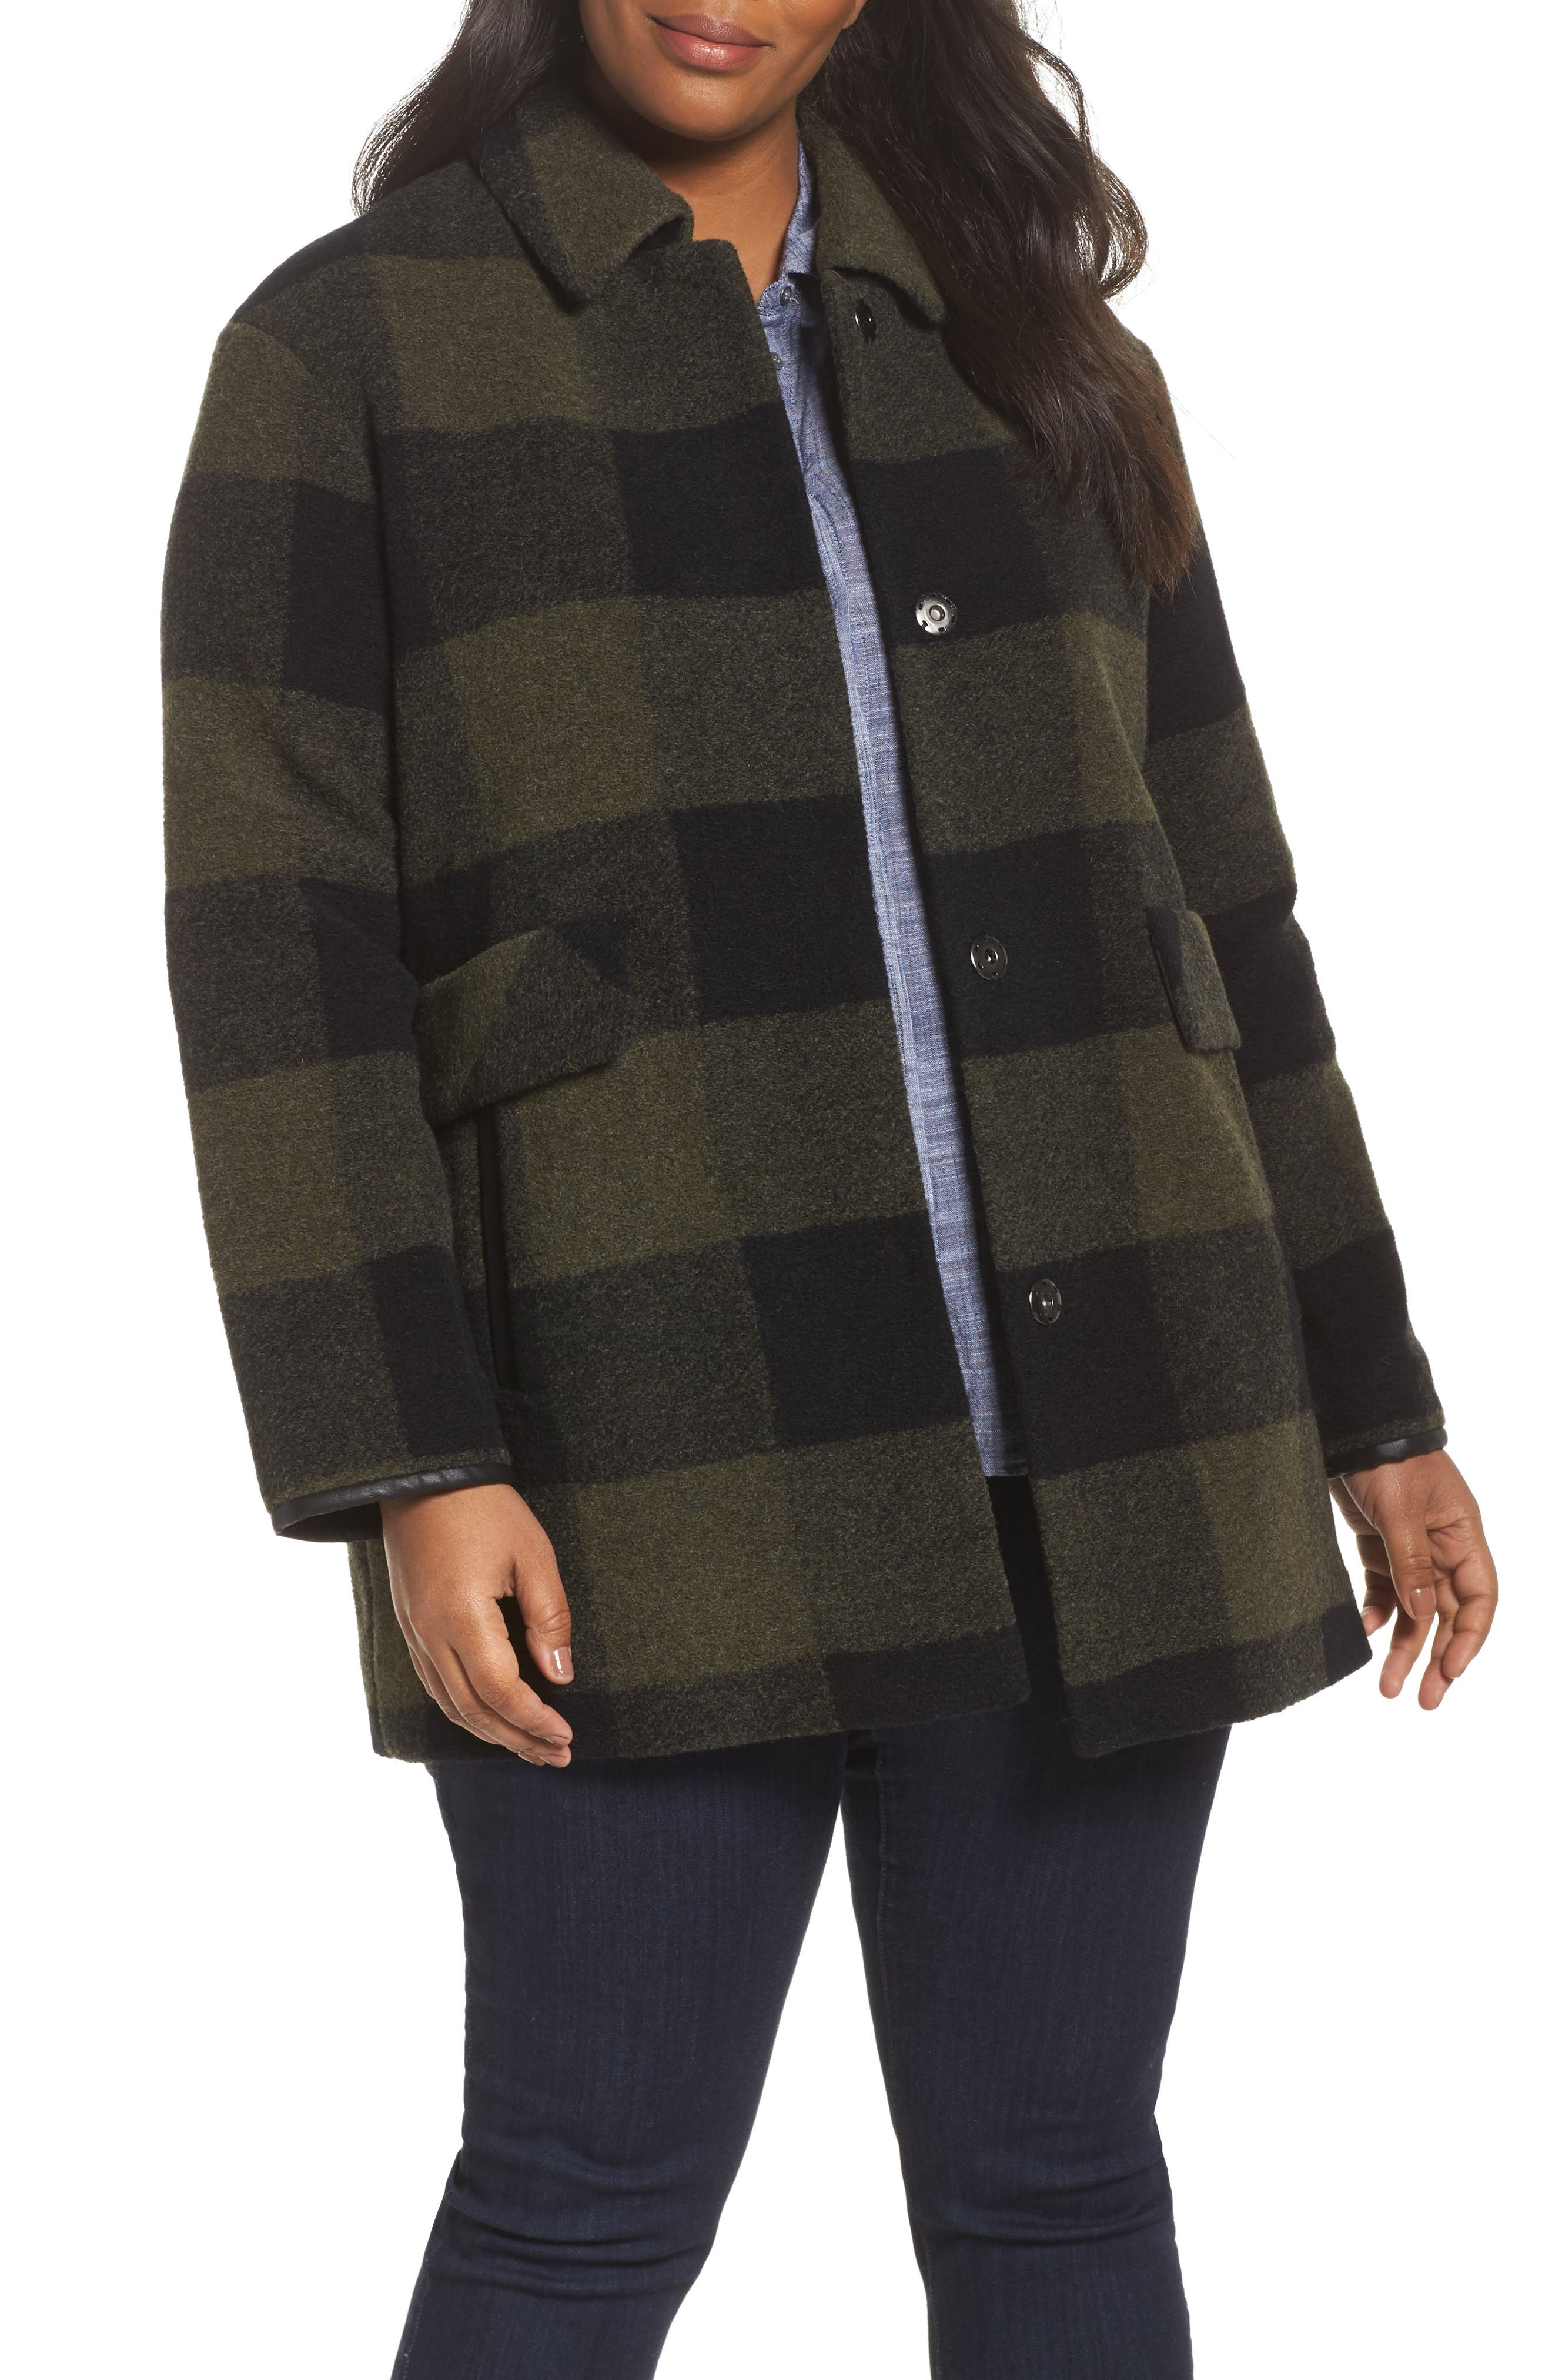 Paul Bunyan Plaid Wool Blend Barn Coat,                         Main,                         color, Olive/ Buff